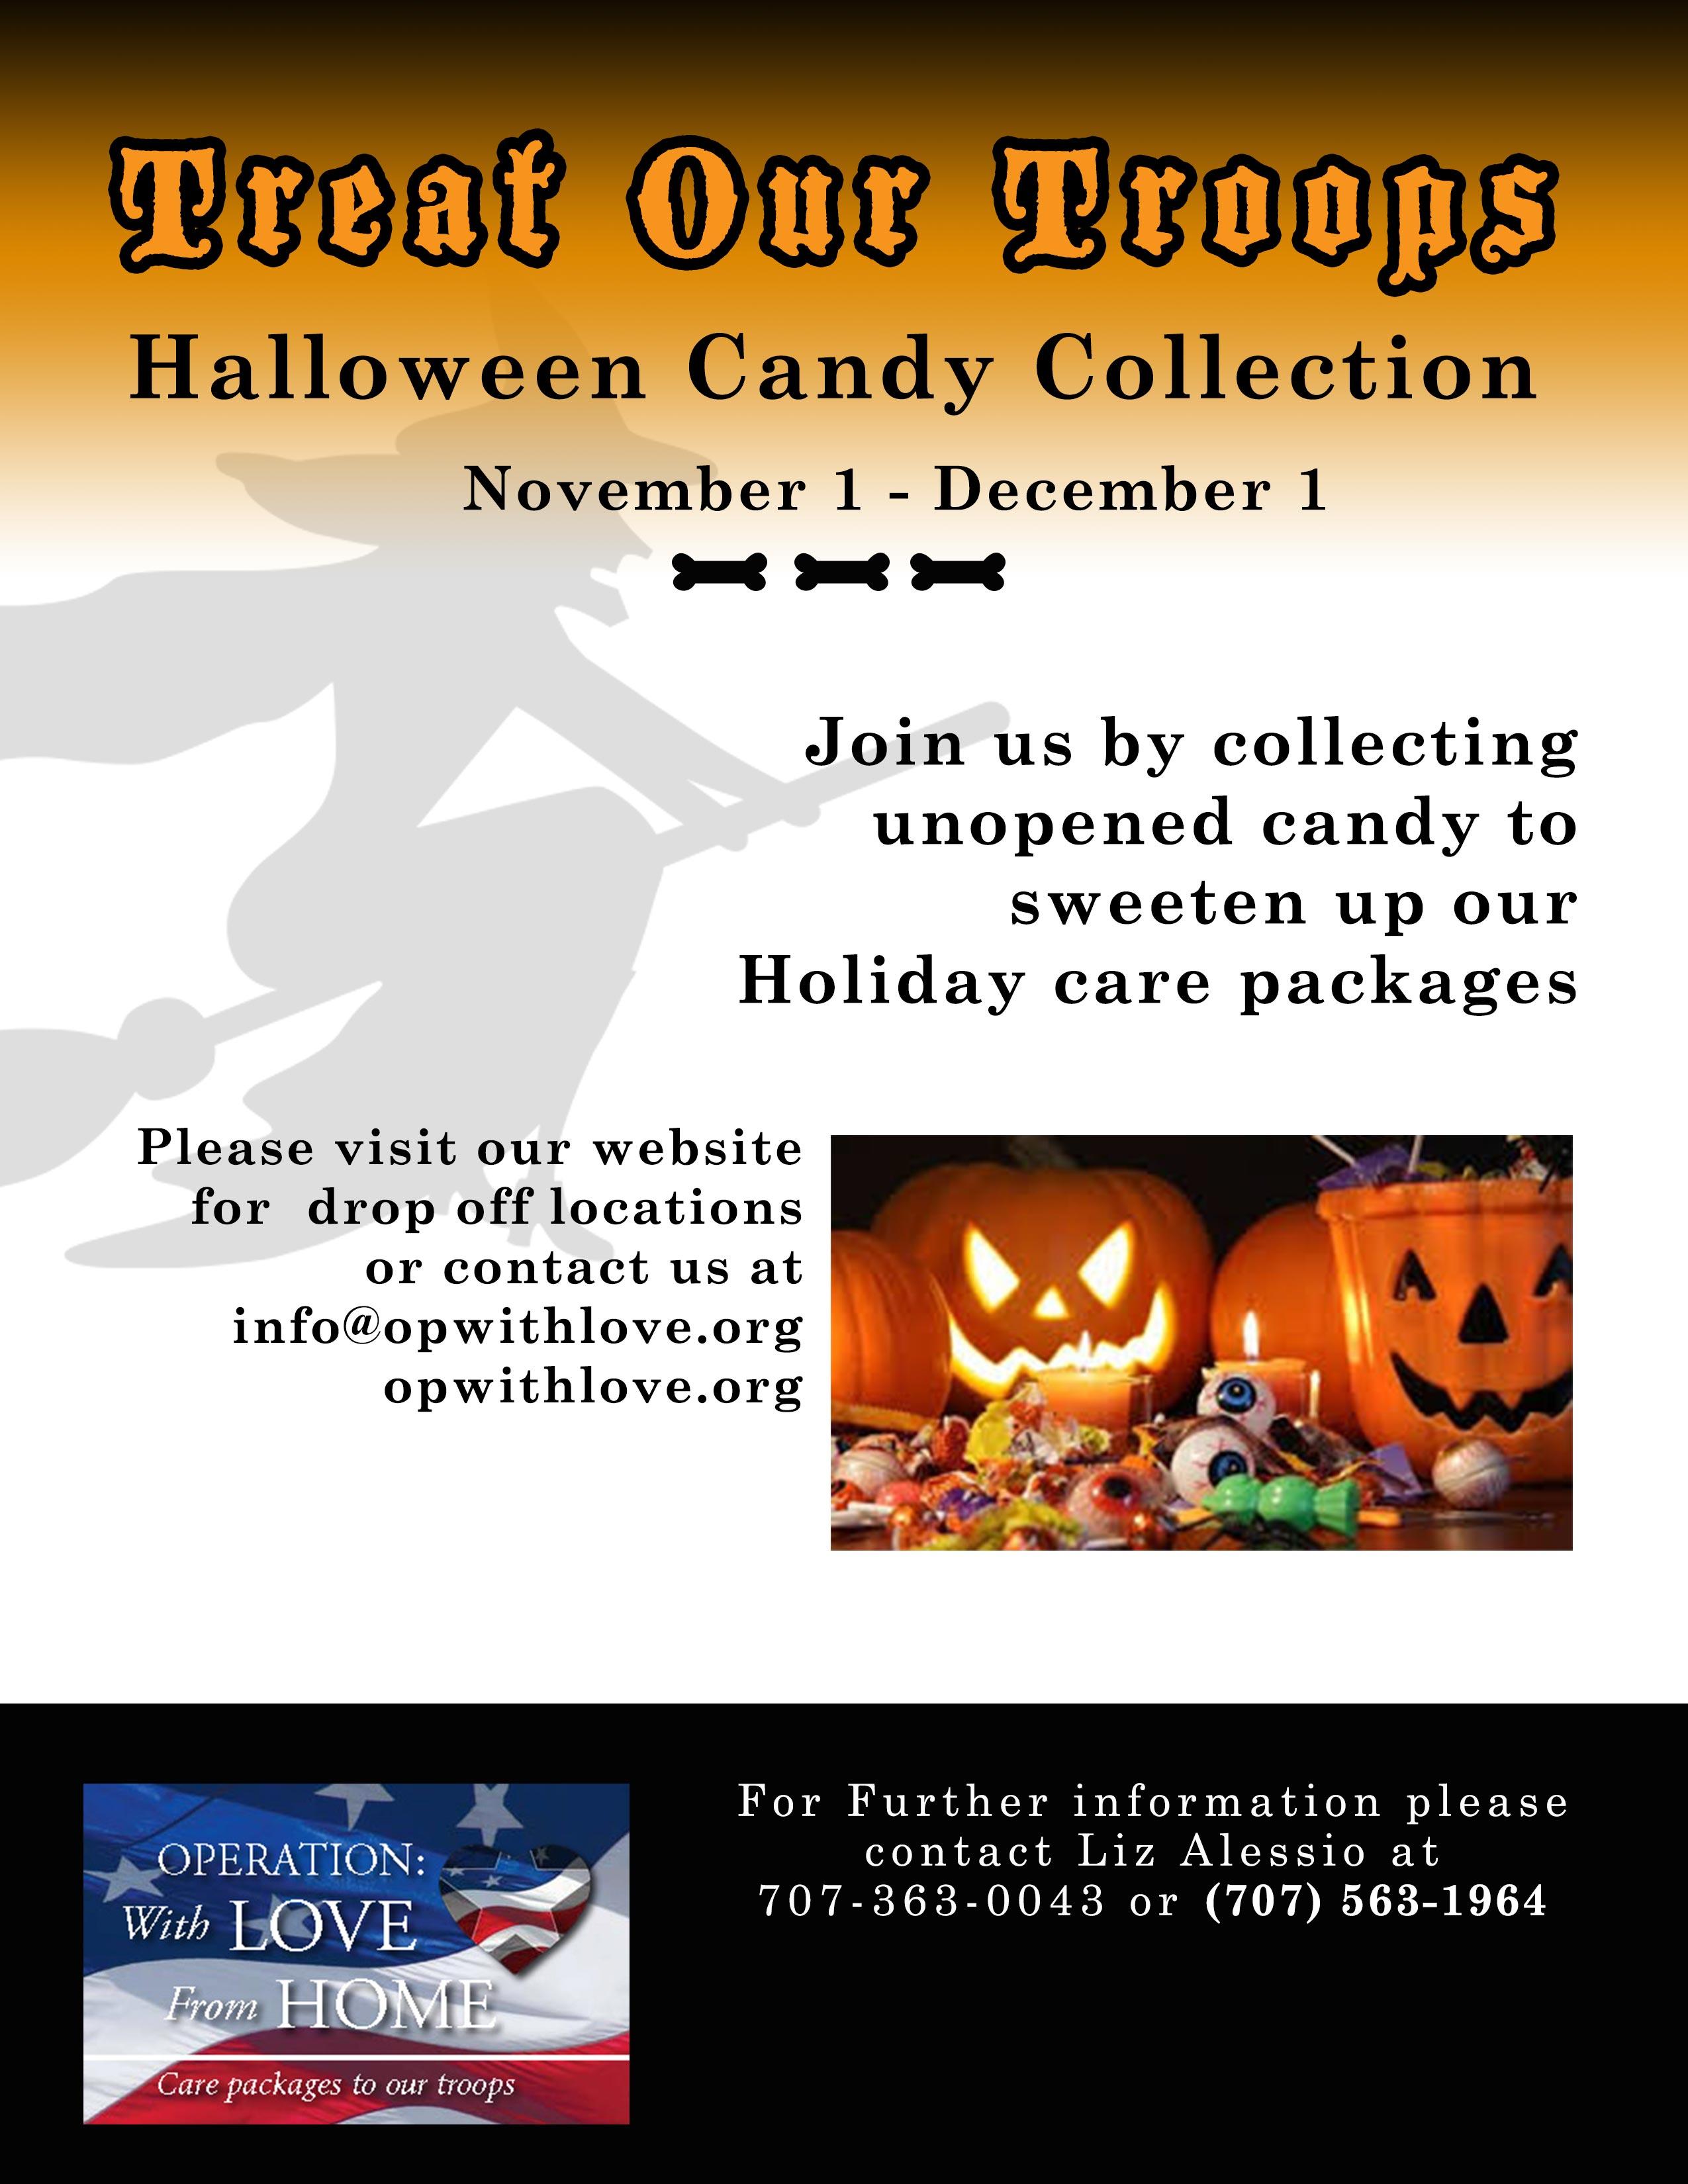 25+ Candy Donation Request Flyer Pics - FreePix